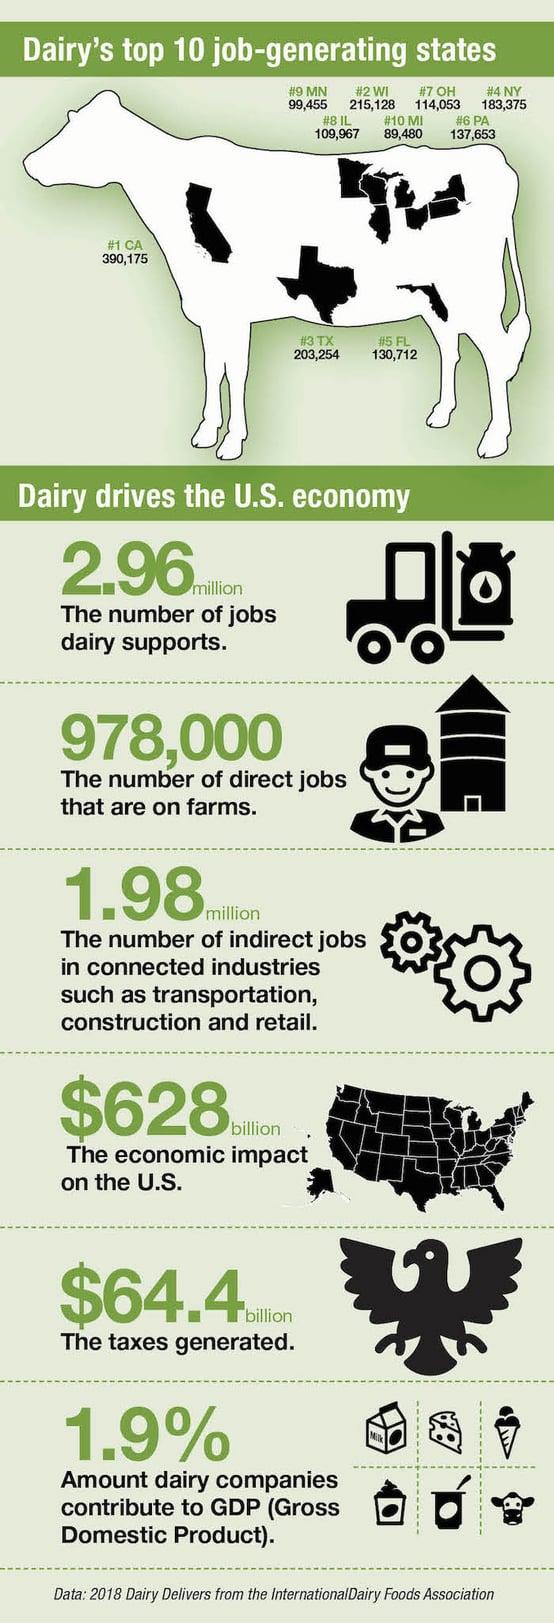 Dairy Herd Management infographic